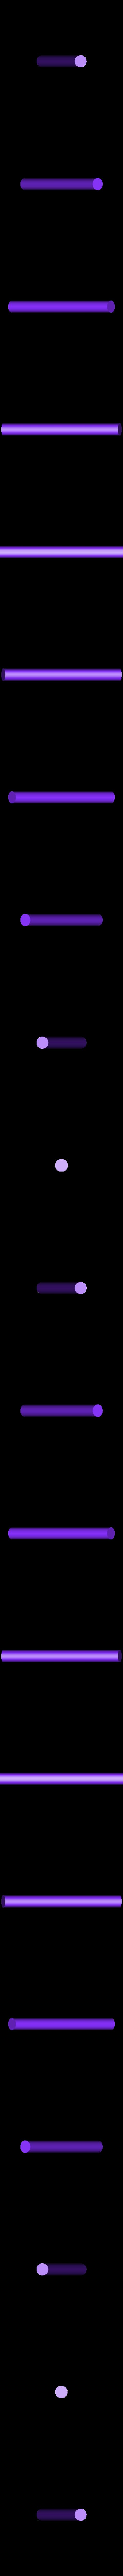 blueprinted_spool_ROD_ONLY.stl Download free STL file SPOOL HOLDER (BLUEPRINT3D EDITION) • 3D printer object, hugo